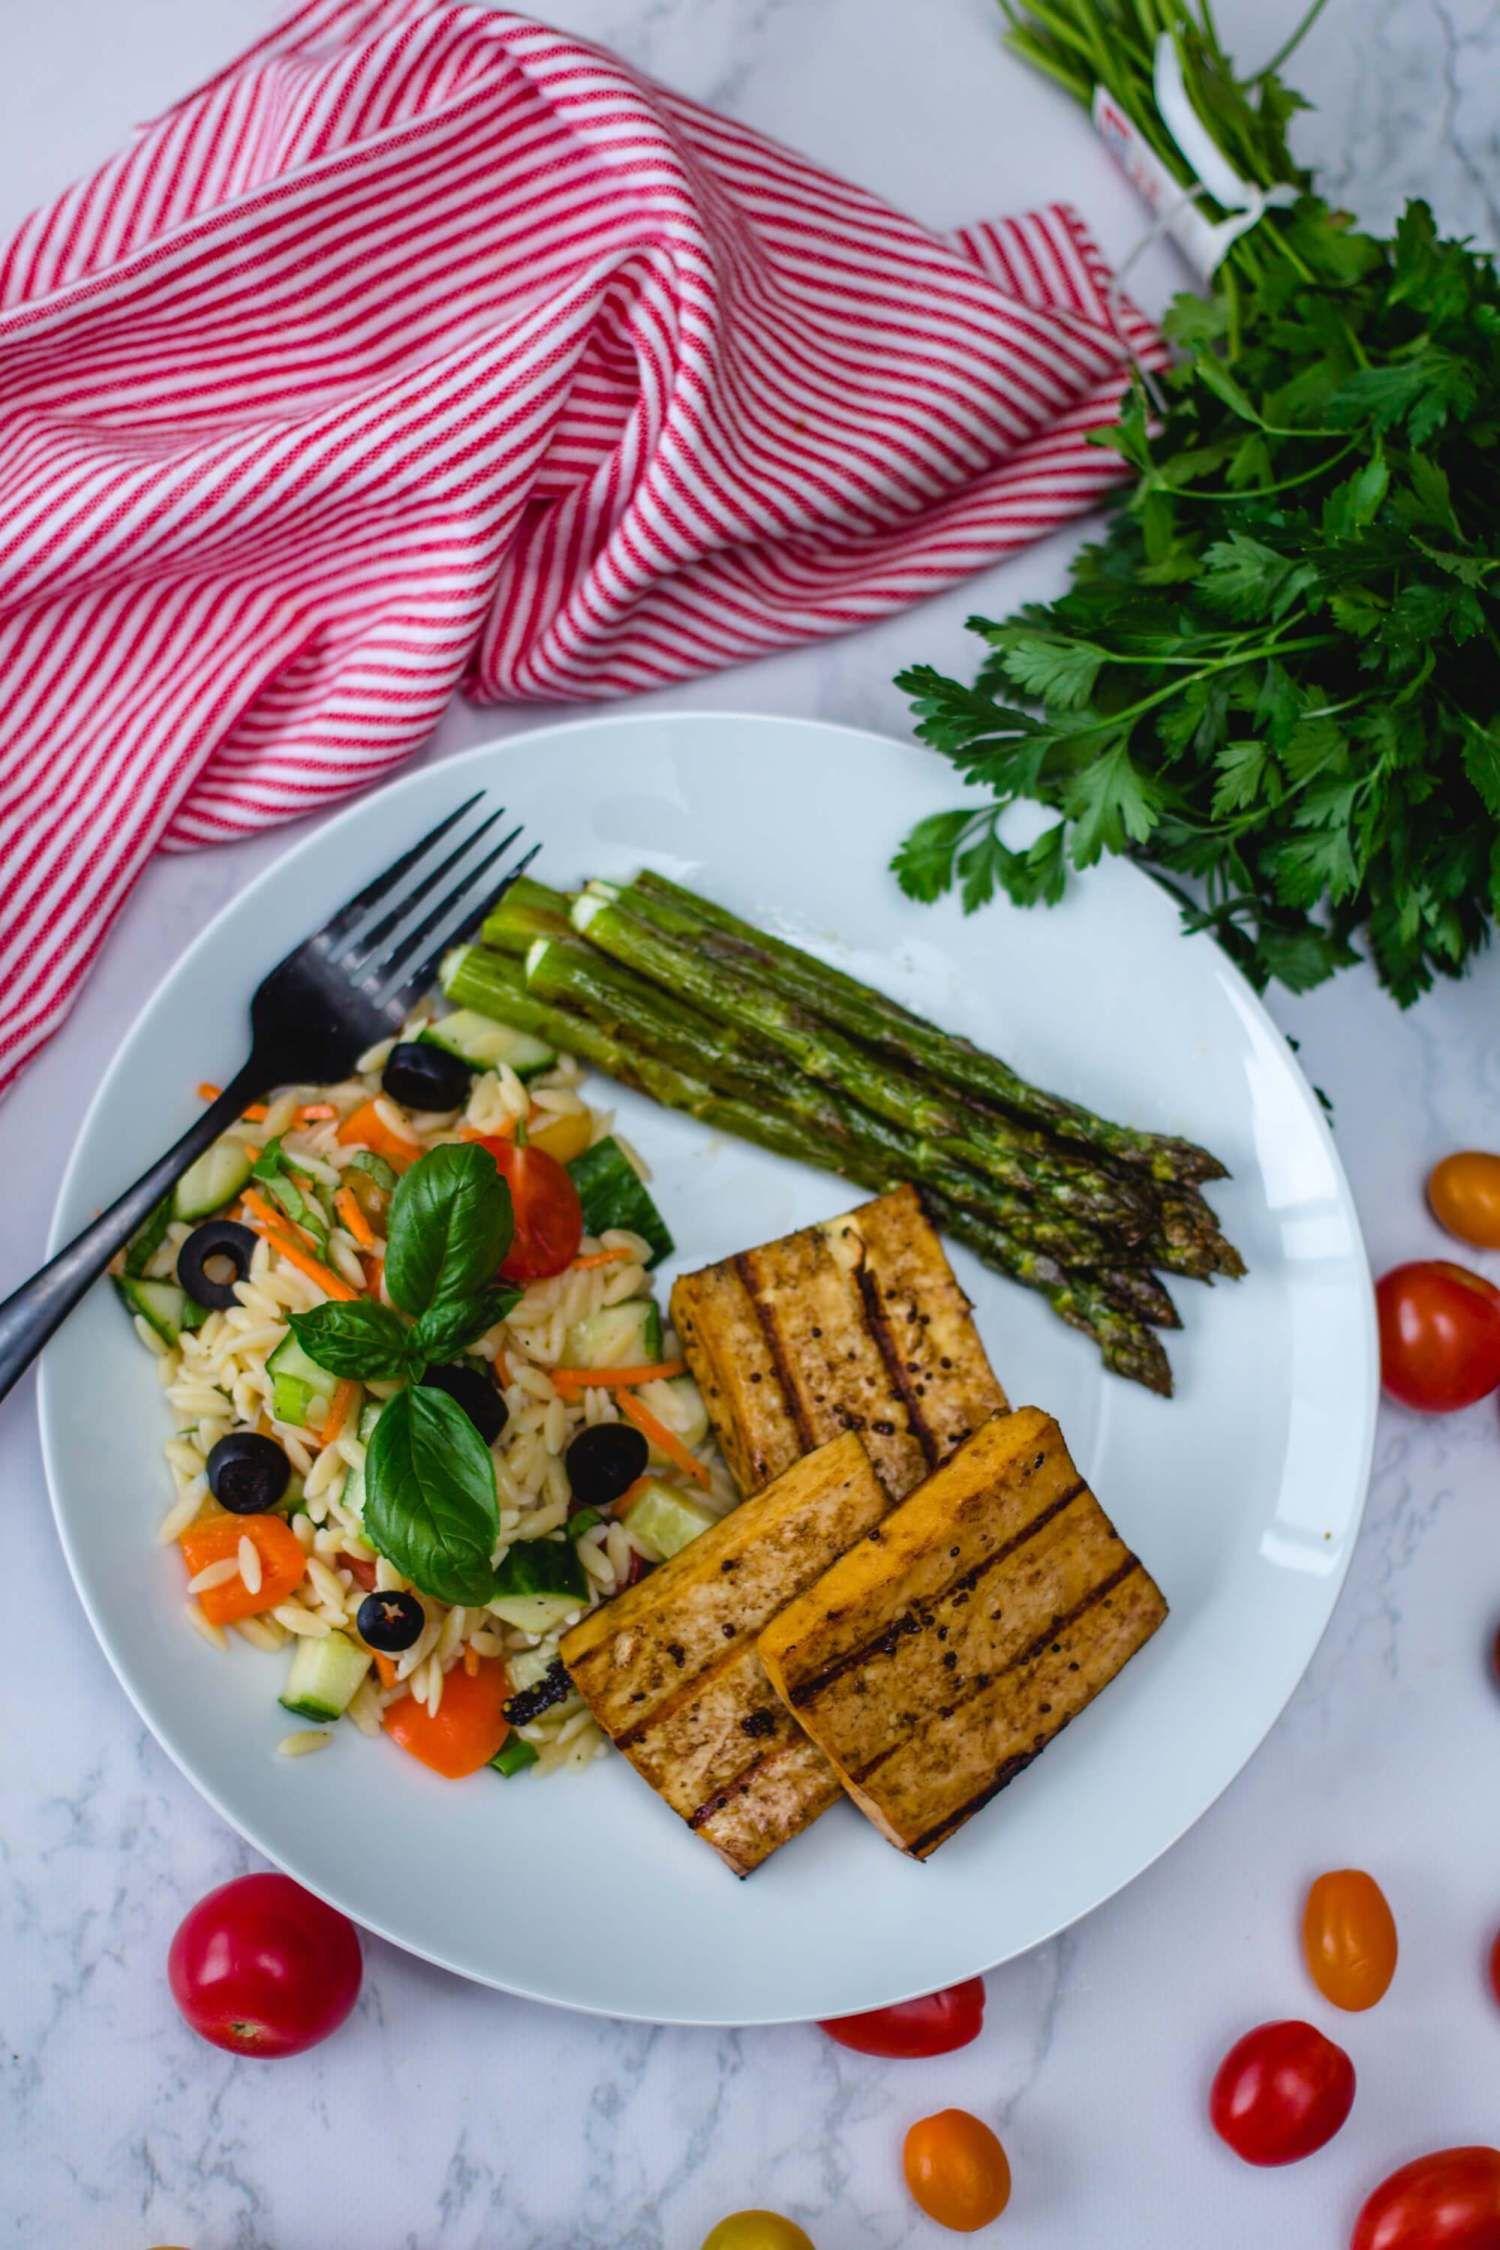 La cuisine méditerranéenne - Anne-Marie Belhadj